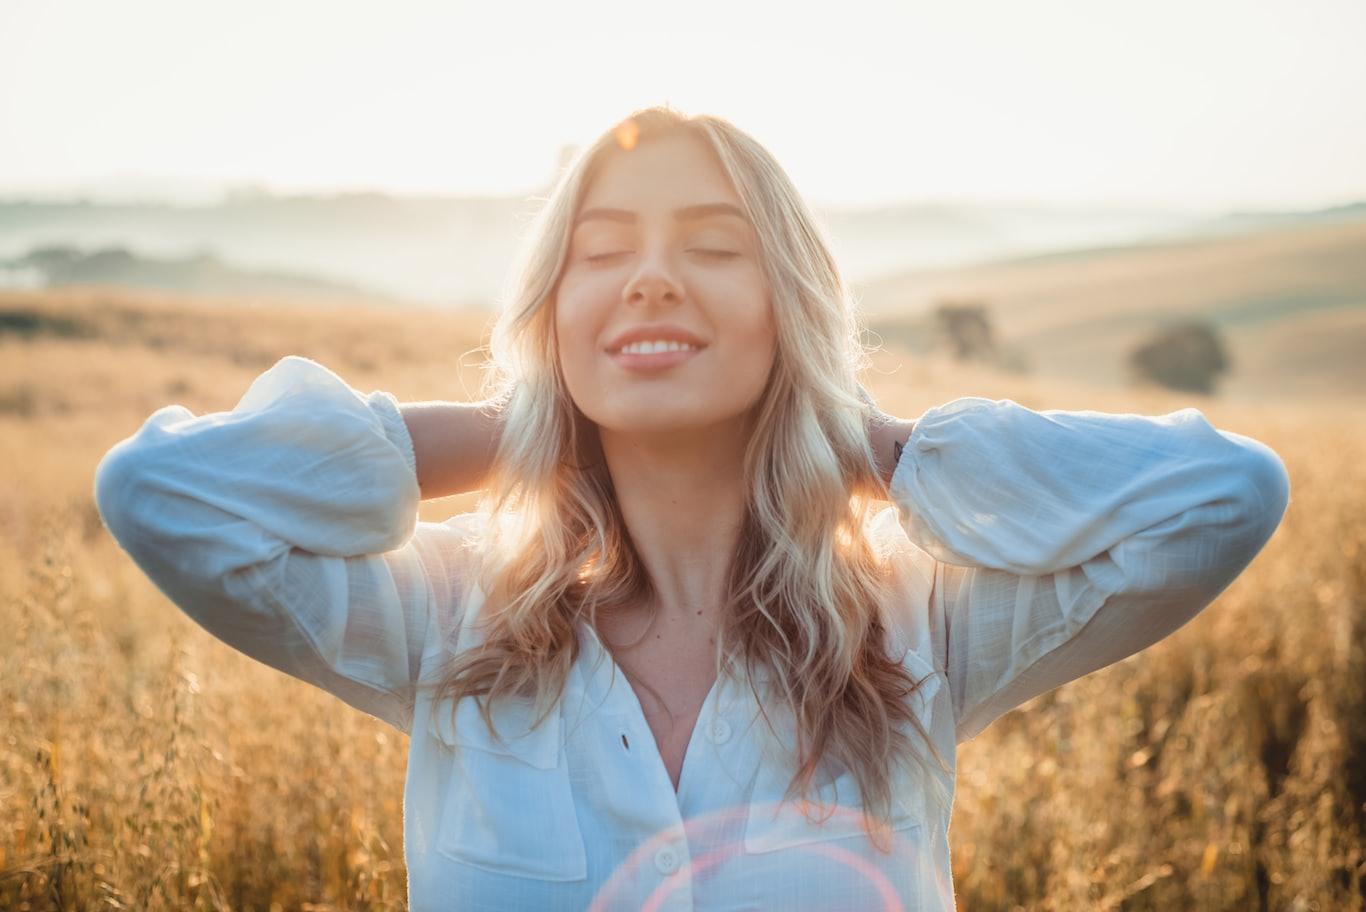 woman in white dress shirt smiling